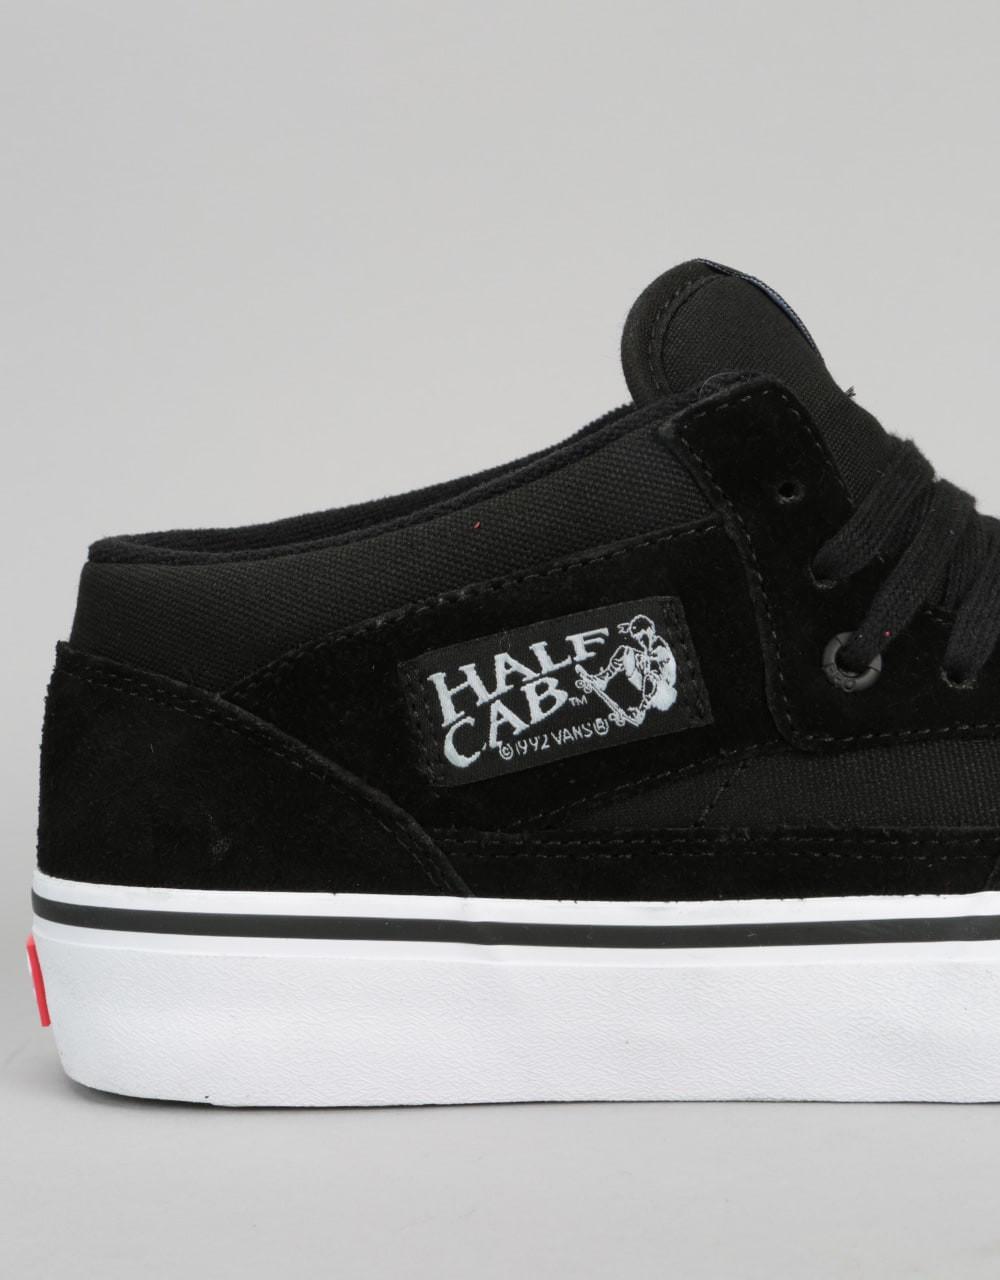 b510c73376 Vans Half Cab Pro Skate Shoes - Black Black White. Price  £69.95. Image 1.  Larger   More Photos